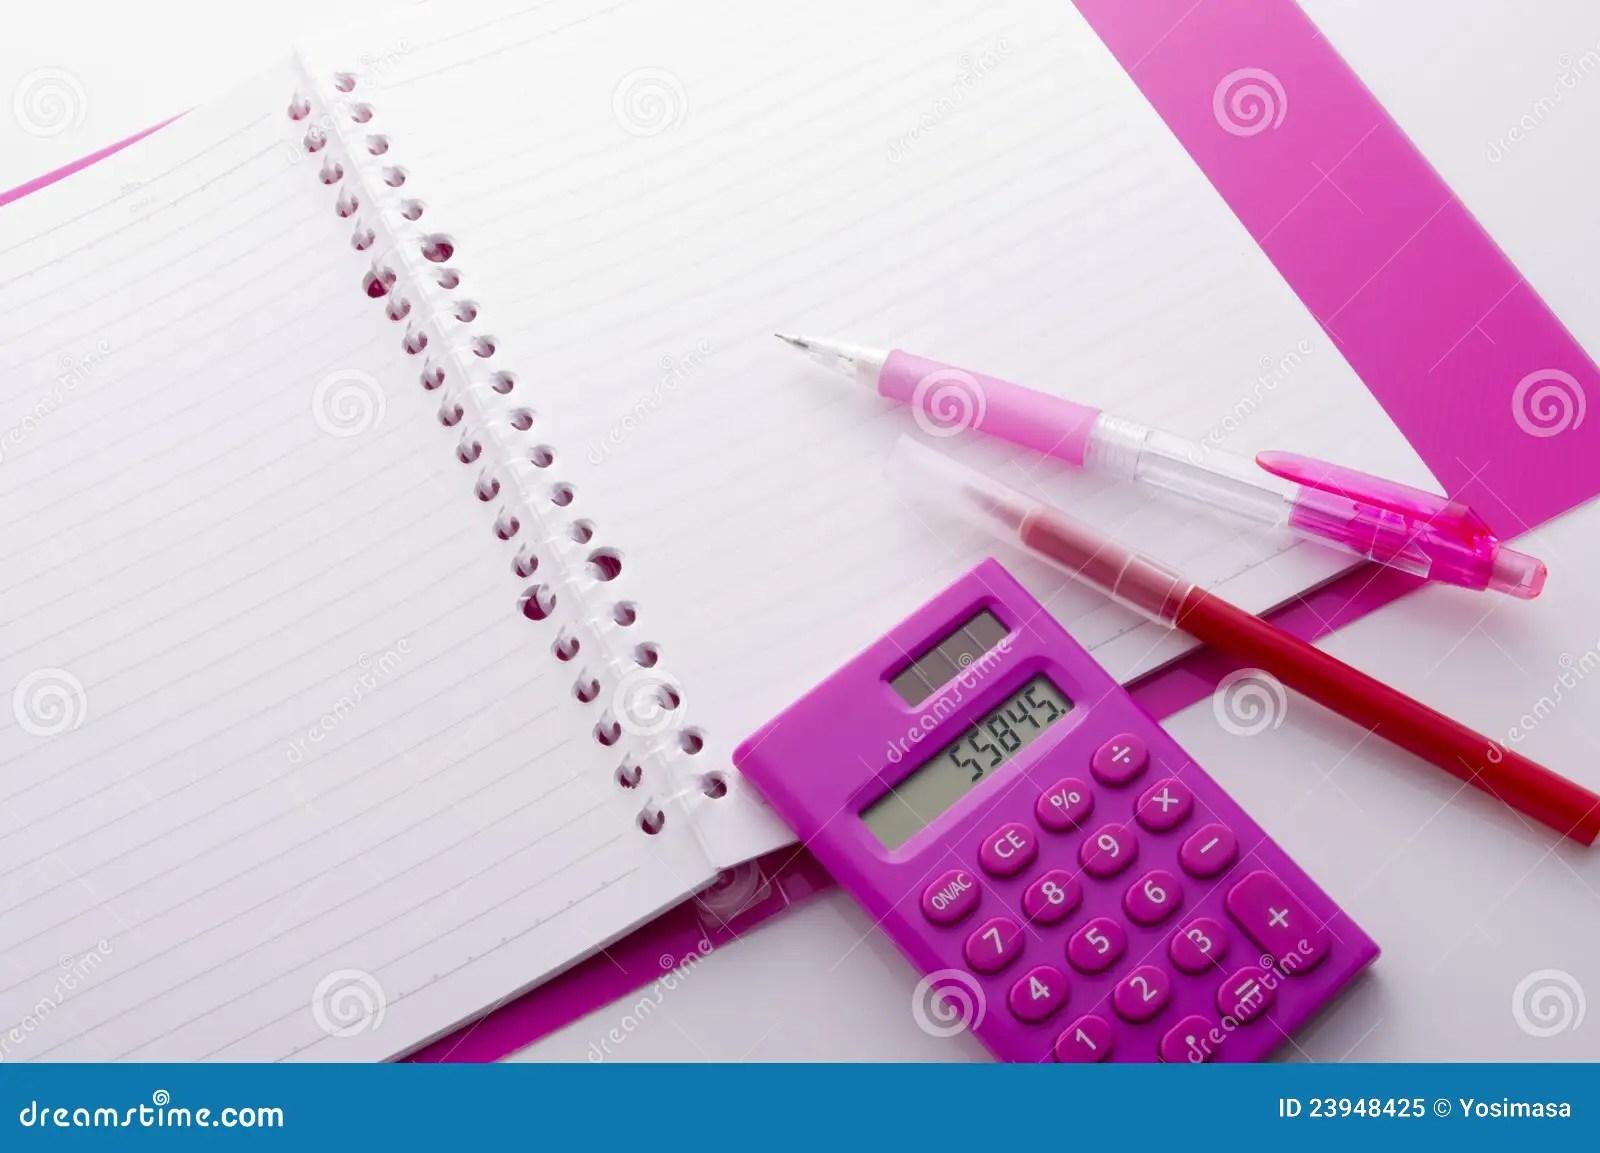 Accounting Tools Royalty Free Stock Photo